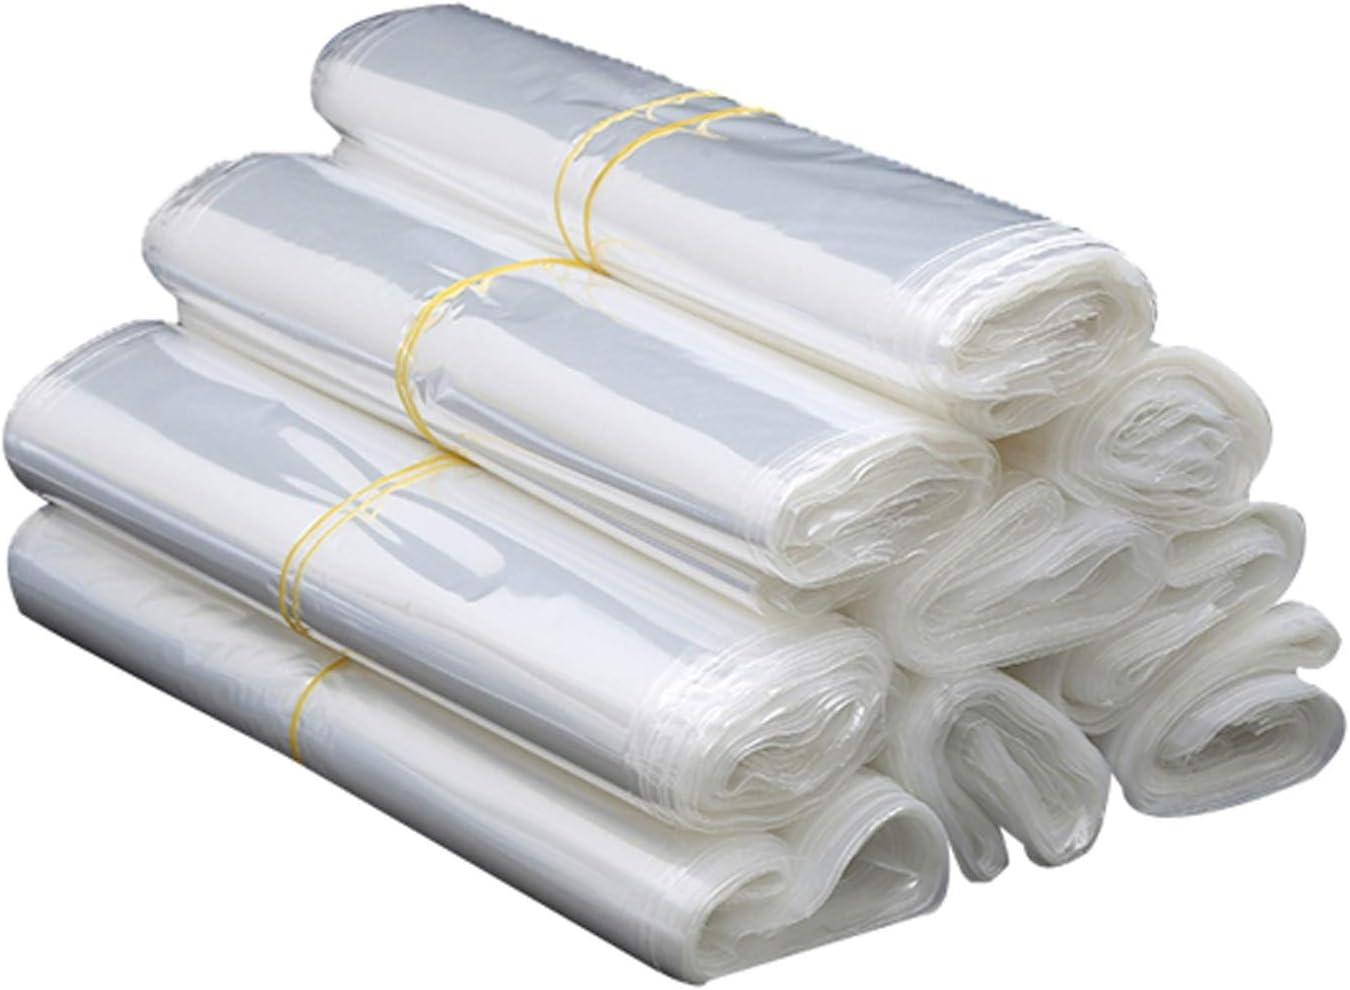 XYJNN Shrink Film Protection Bag 100pcs famous Packagin Shrinkable Brand new Heat